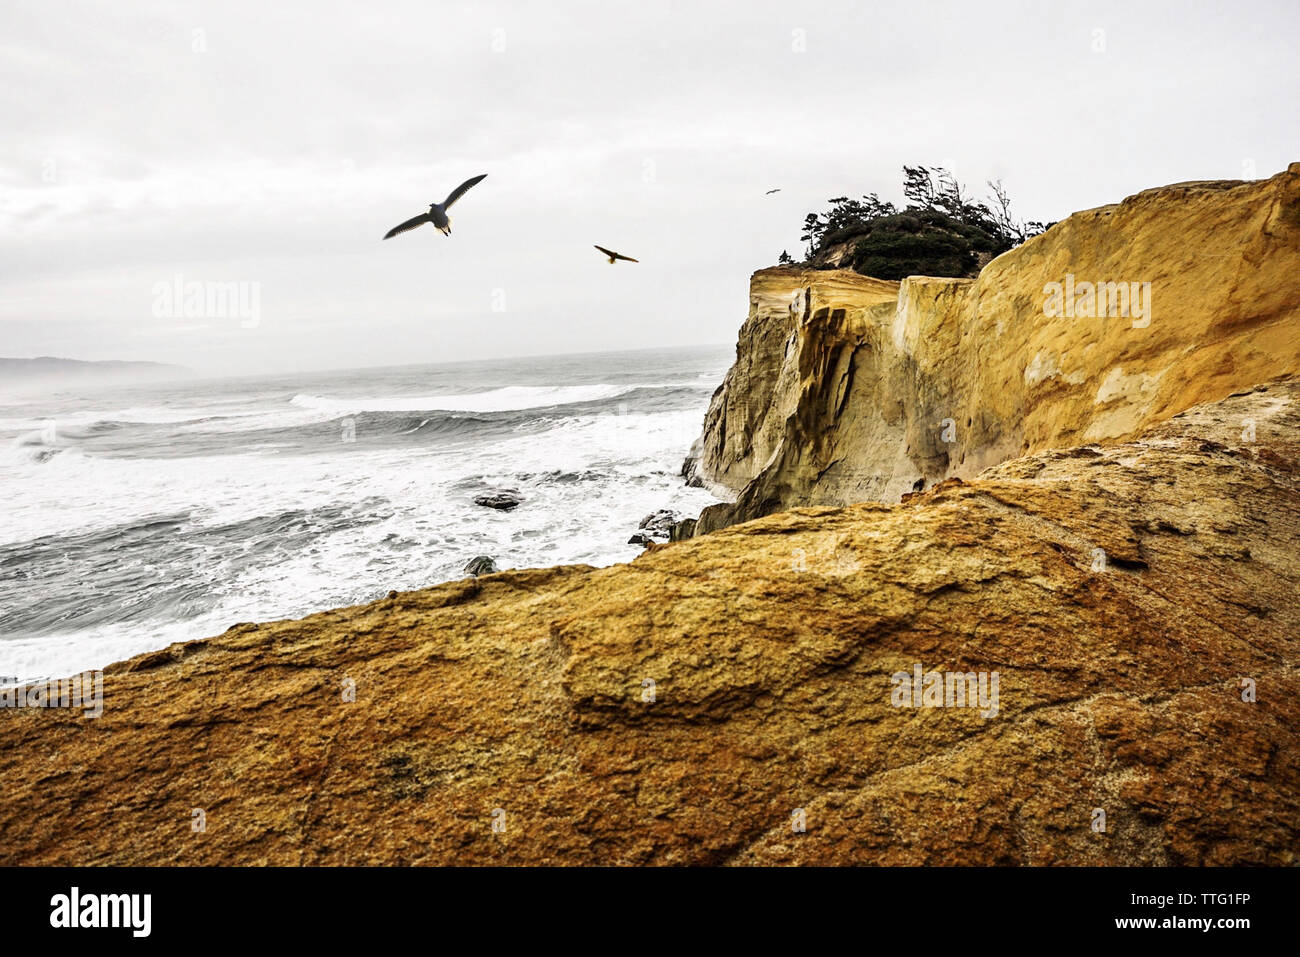 Birds flying over sea against cloudy sky Stock Photo